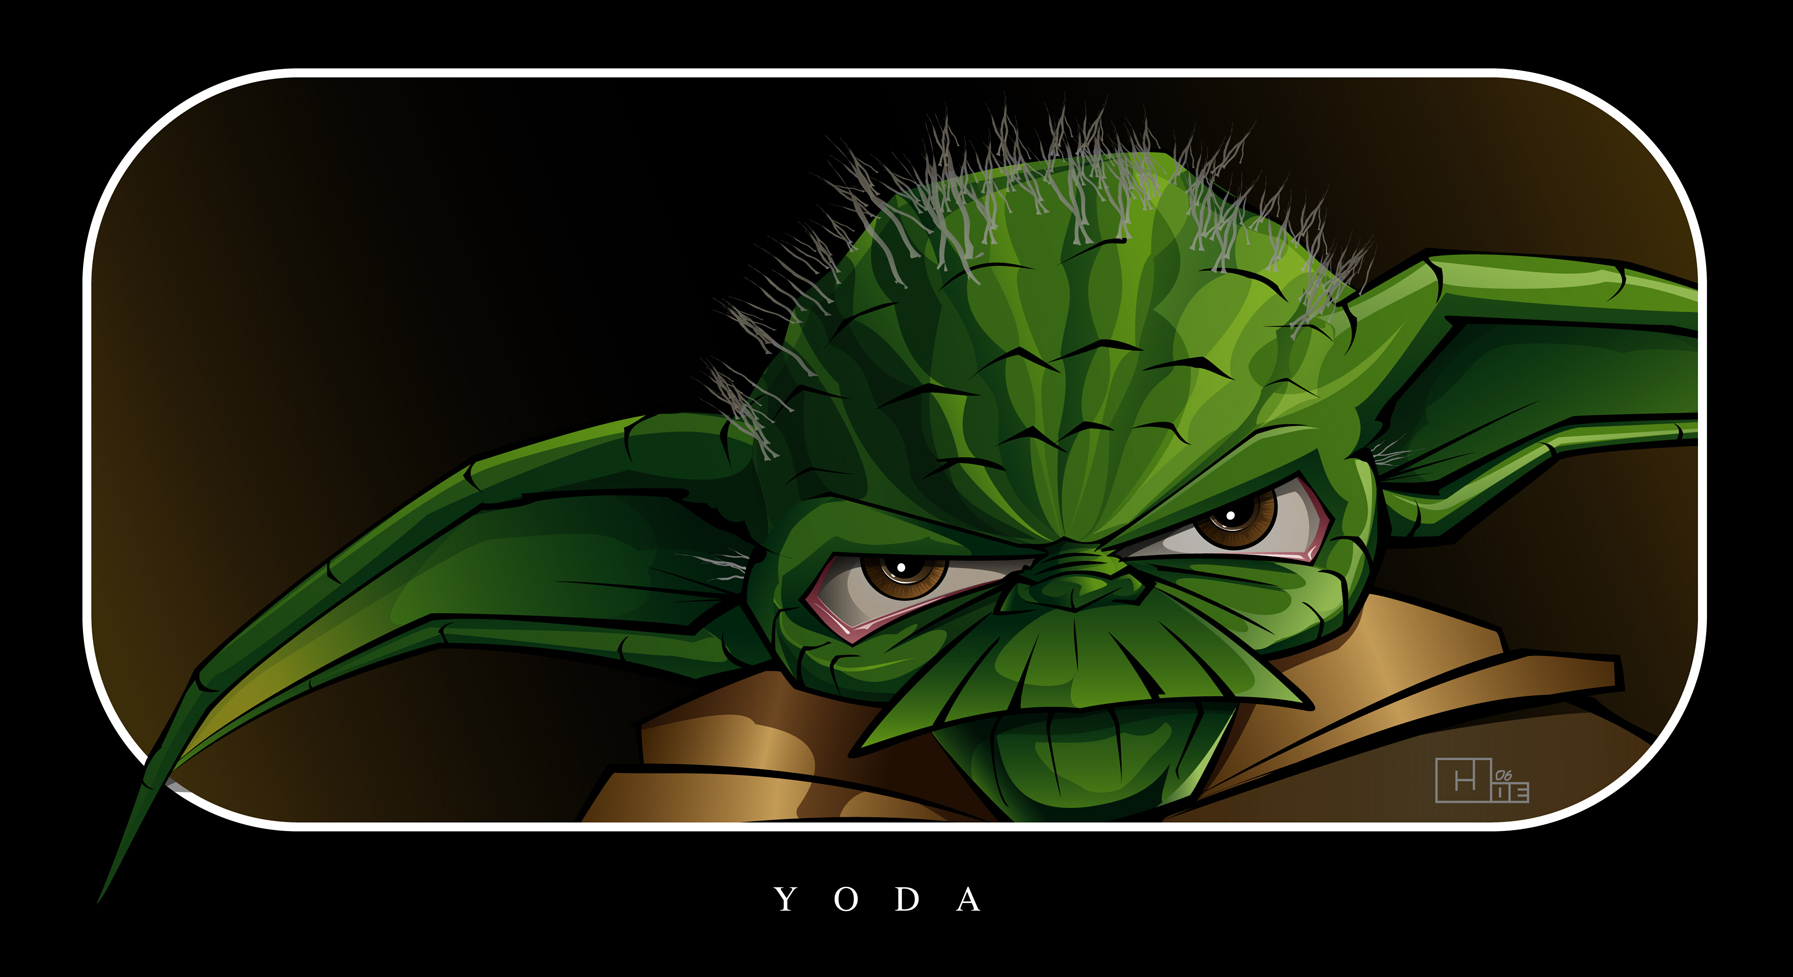 Yoda W.I.P